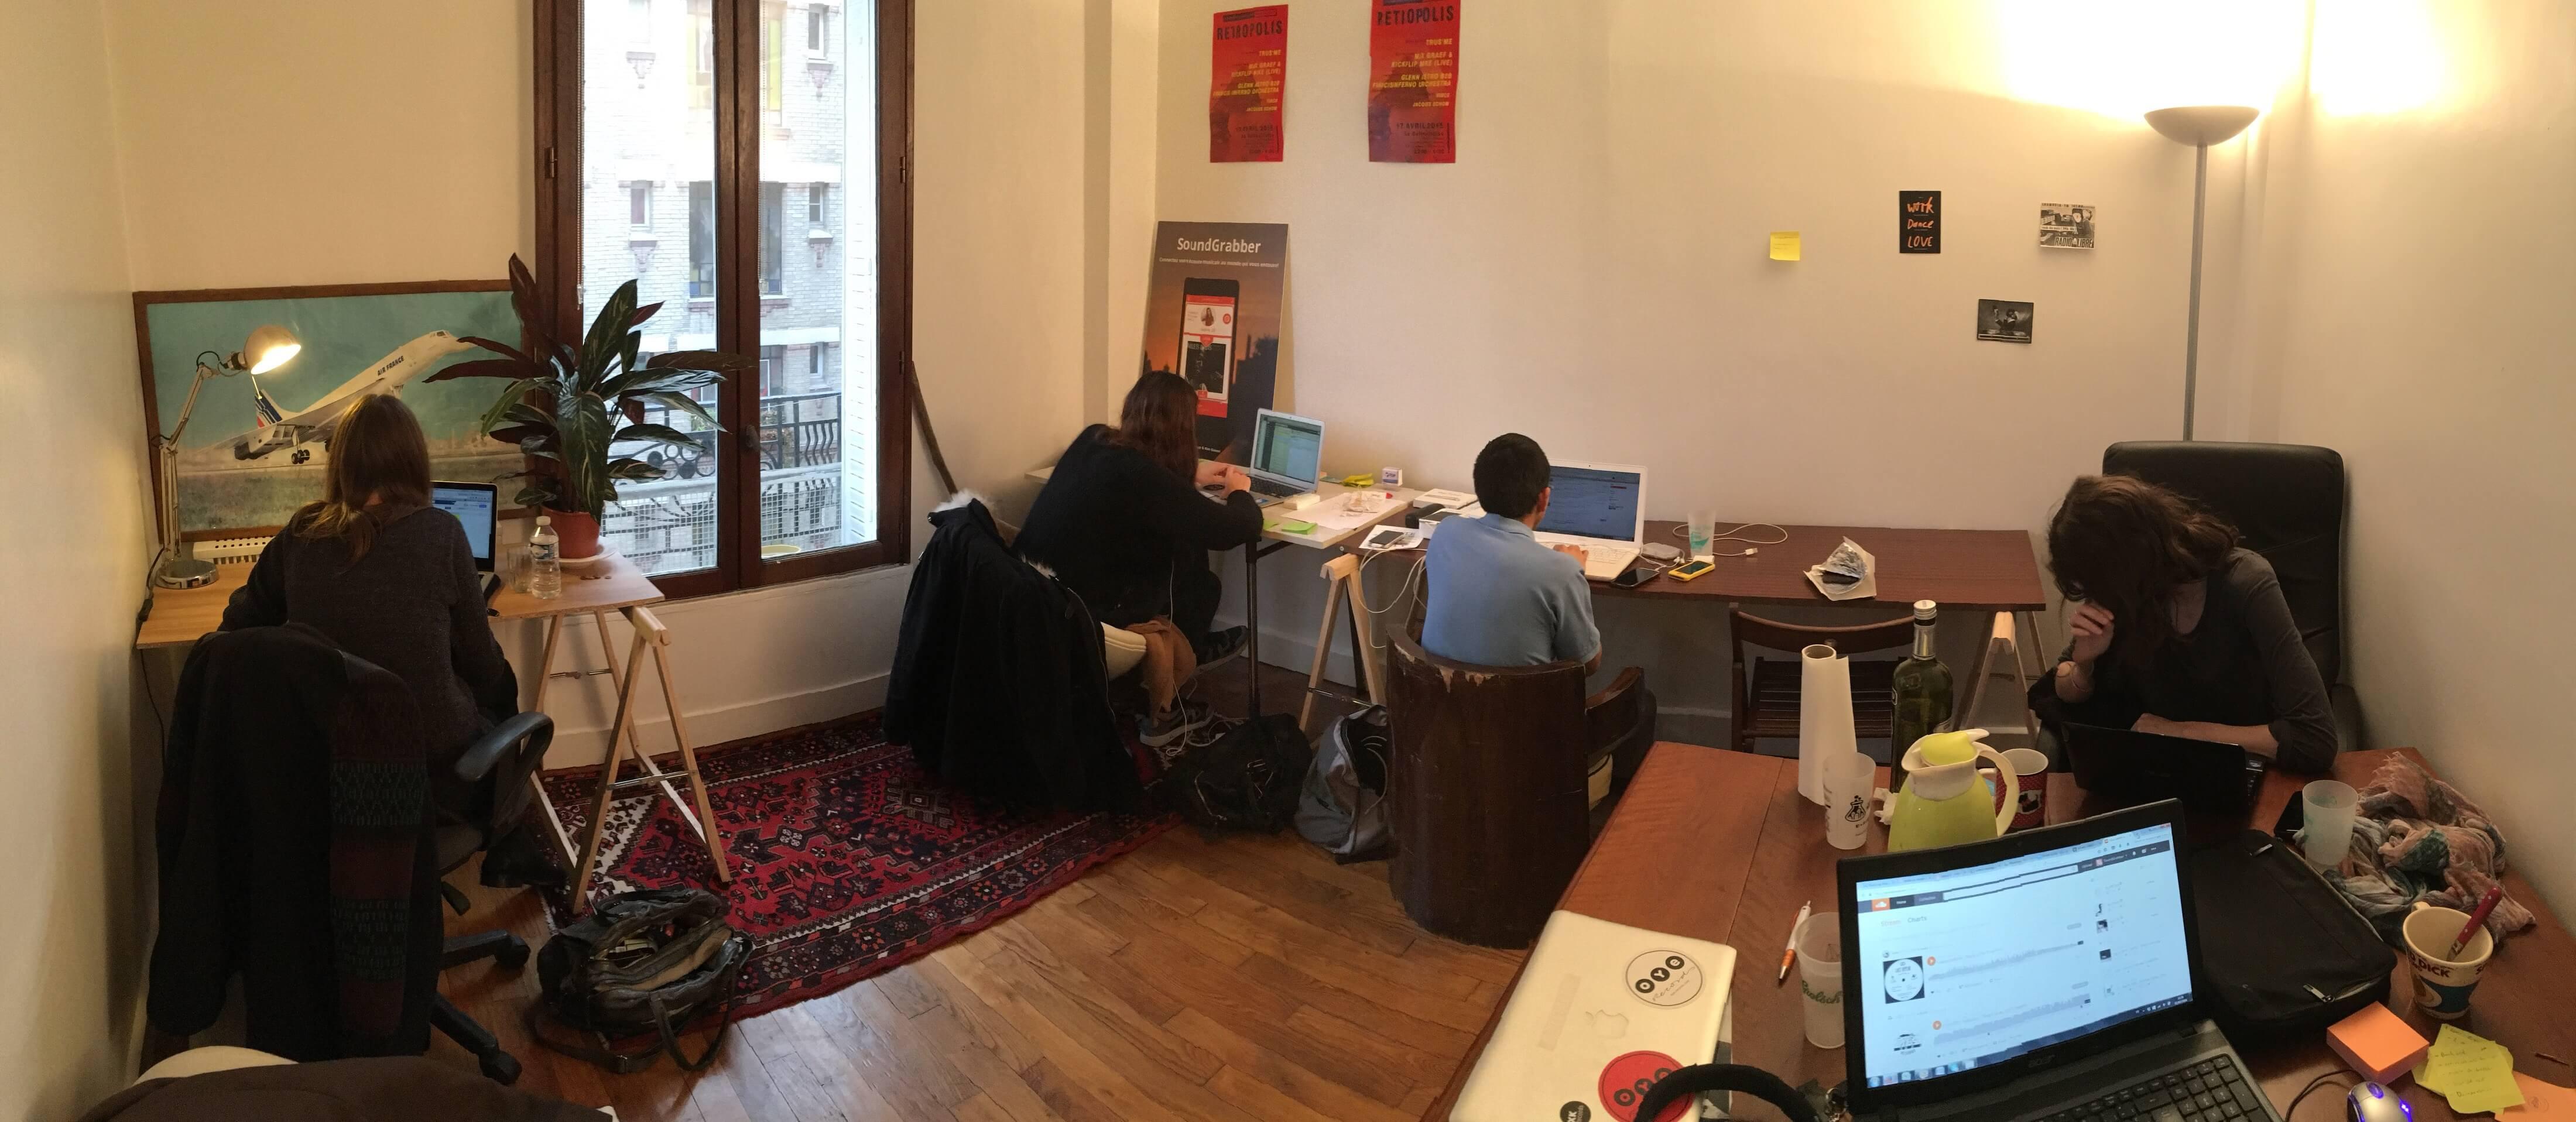 SoundGrabber, musique, rencontre, start-up, entrepreneuriat